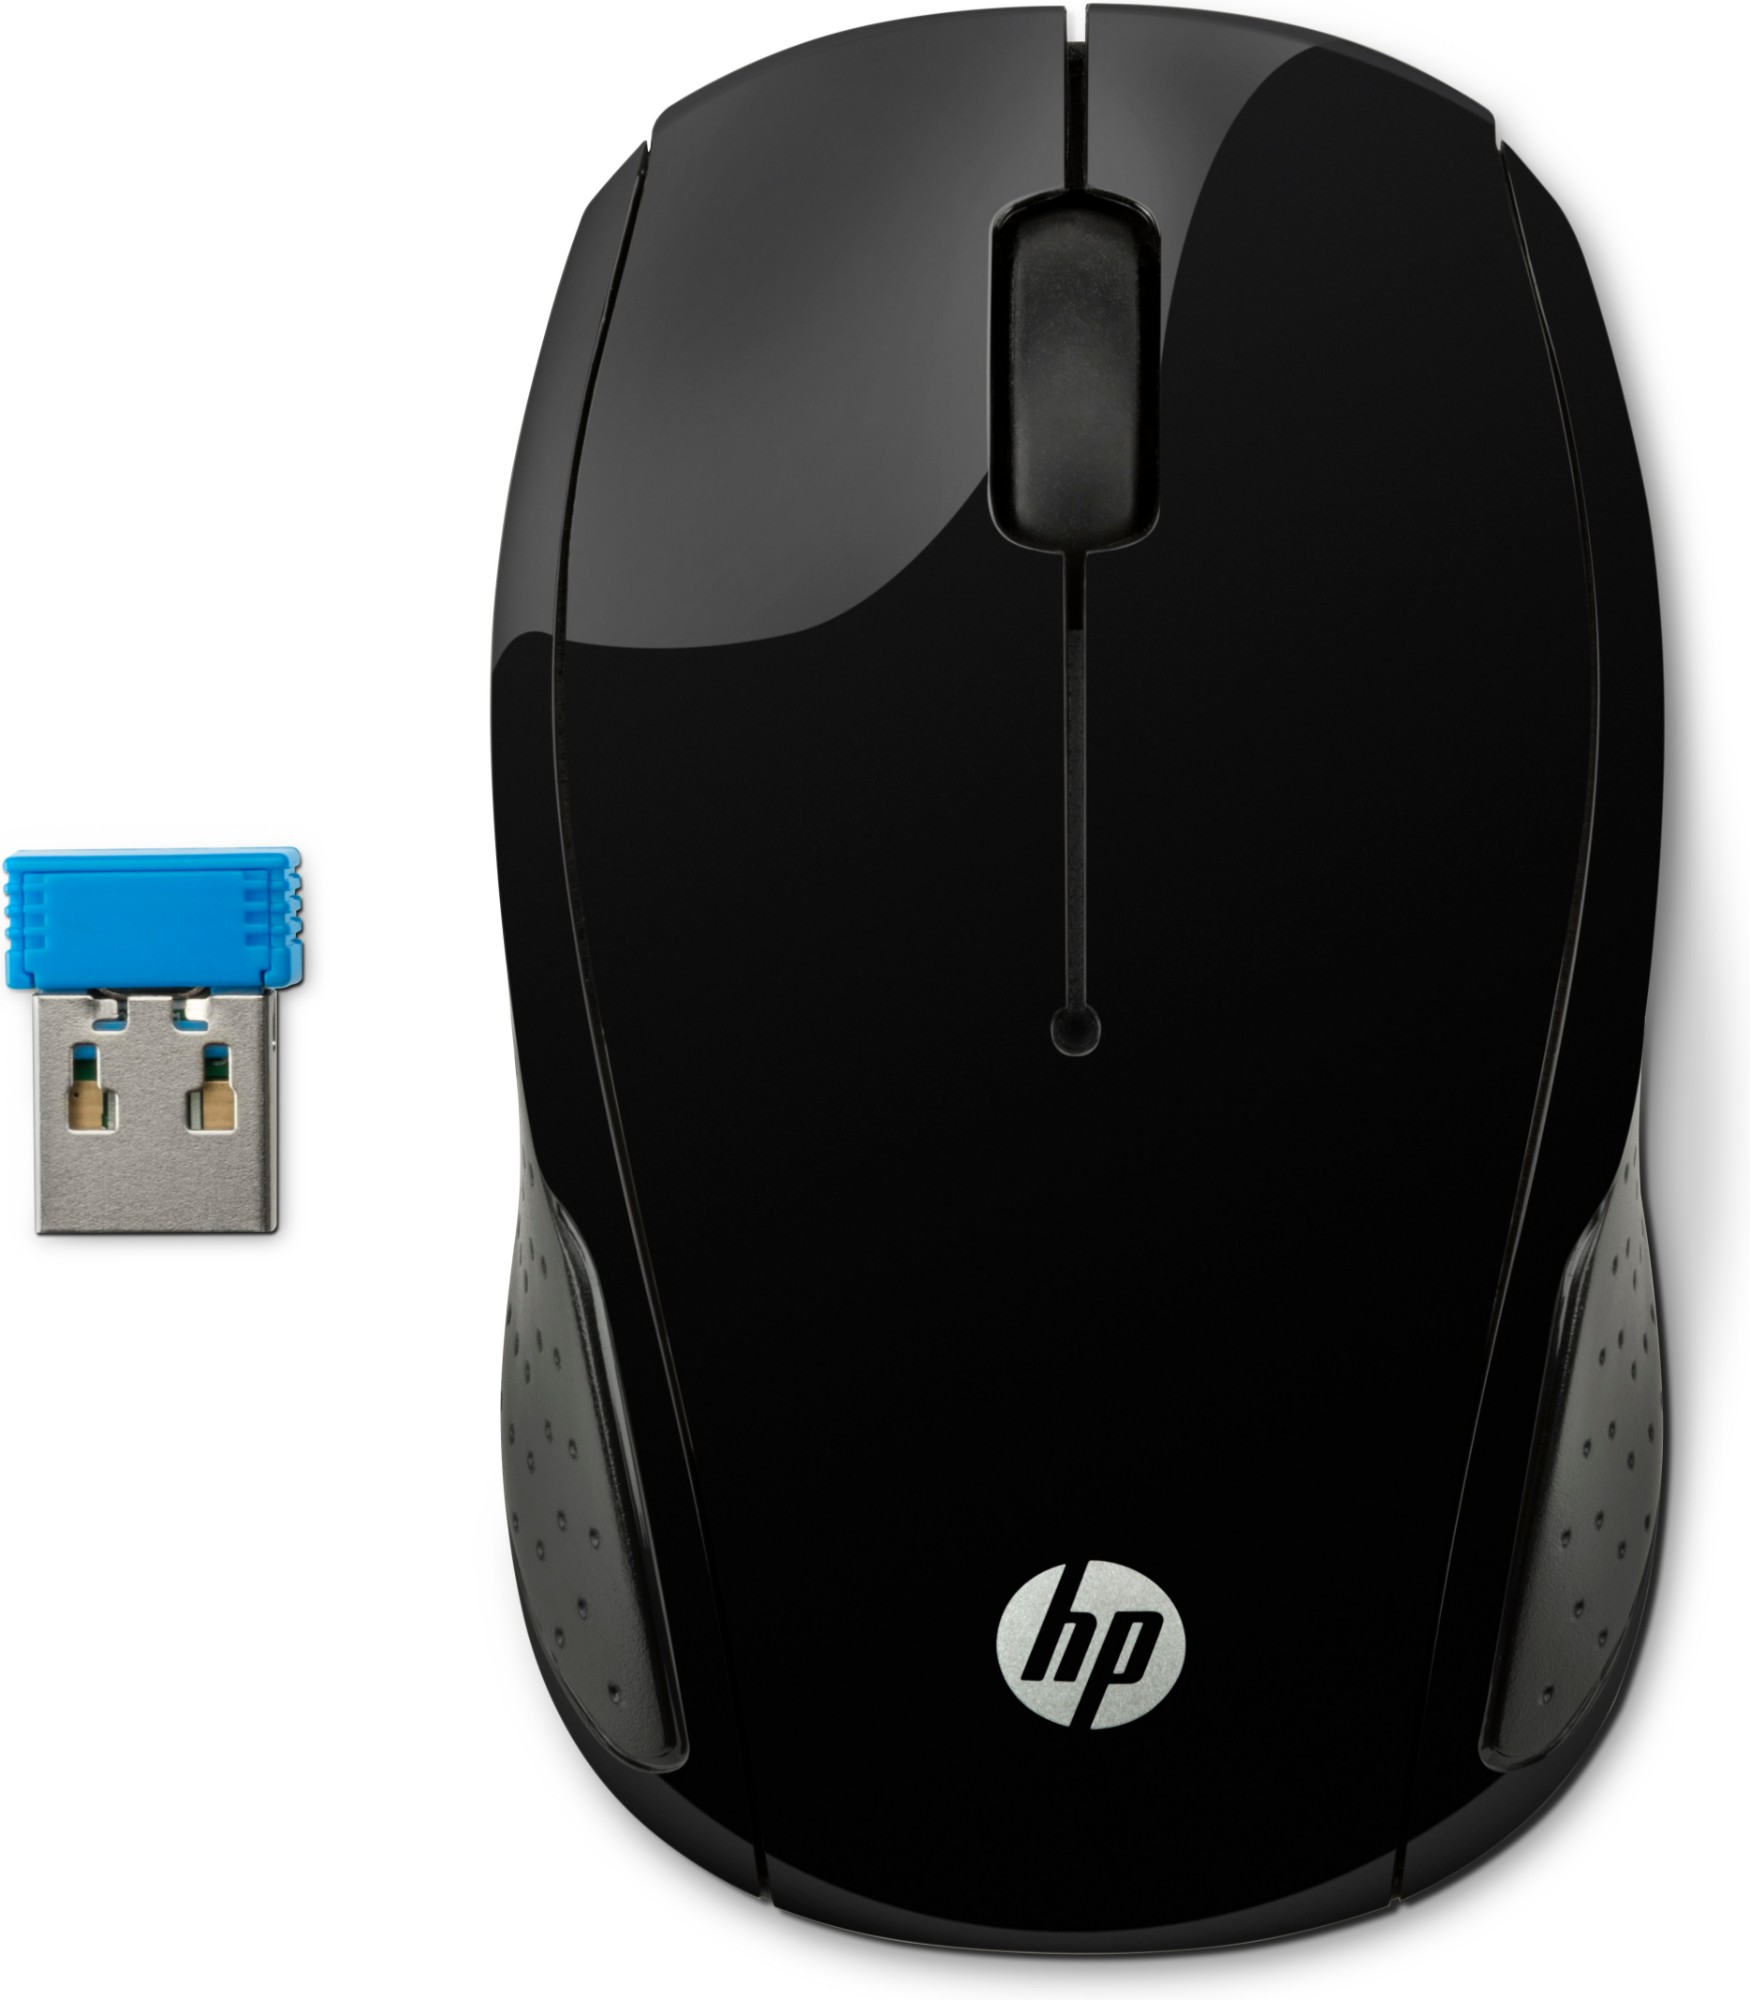 HP 200 mouse Ambidextrous RF Wireless Optical 1000 DPI